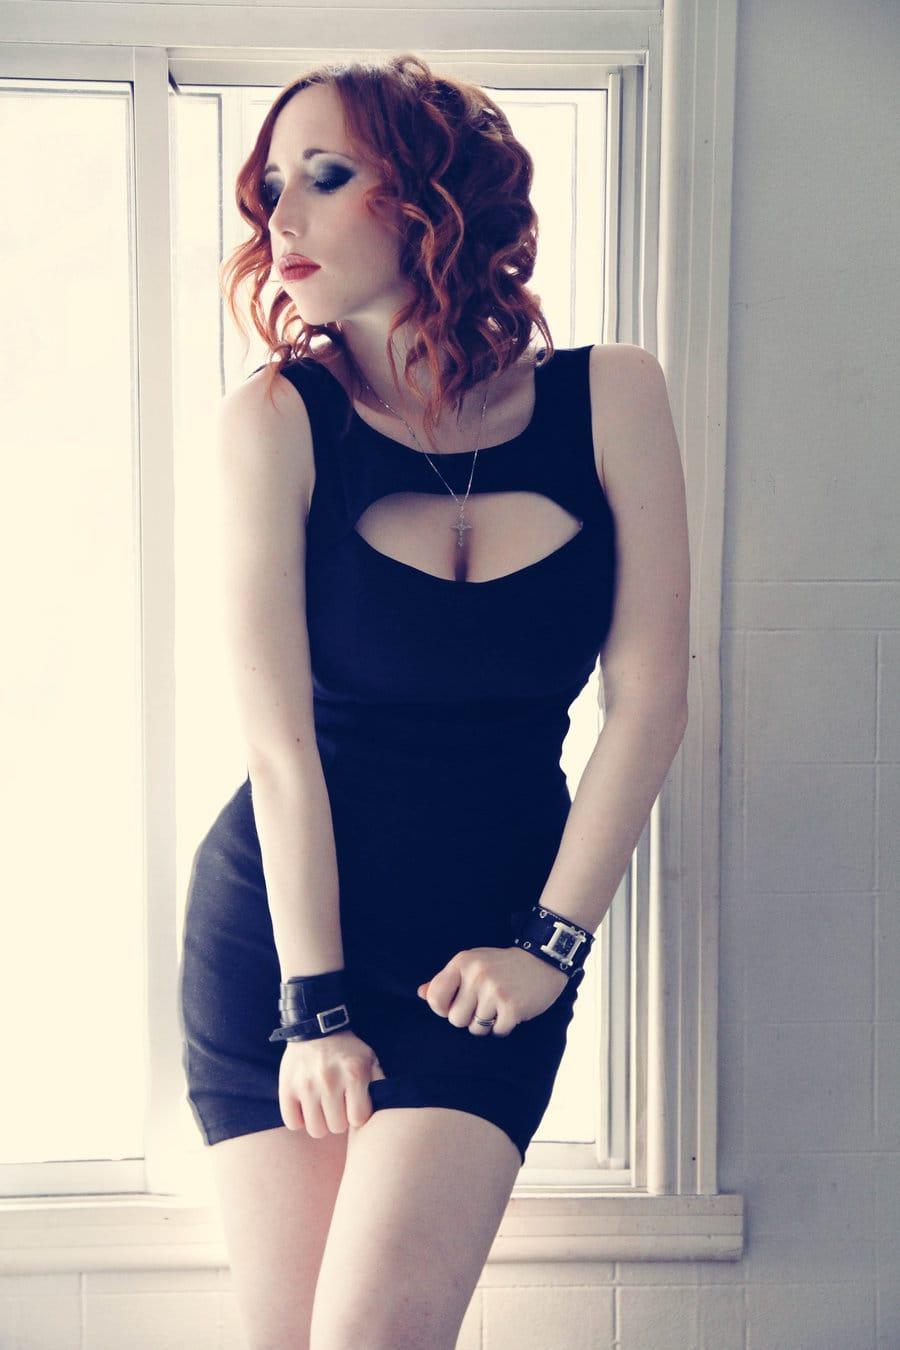 Picture of Stephanie van Rijn